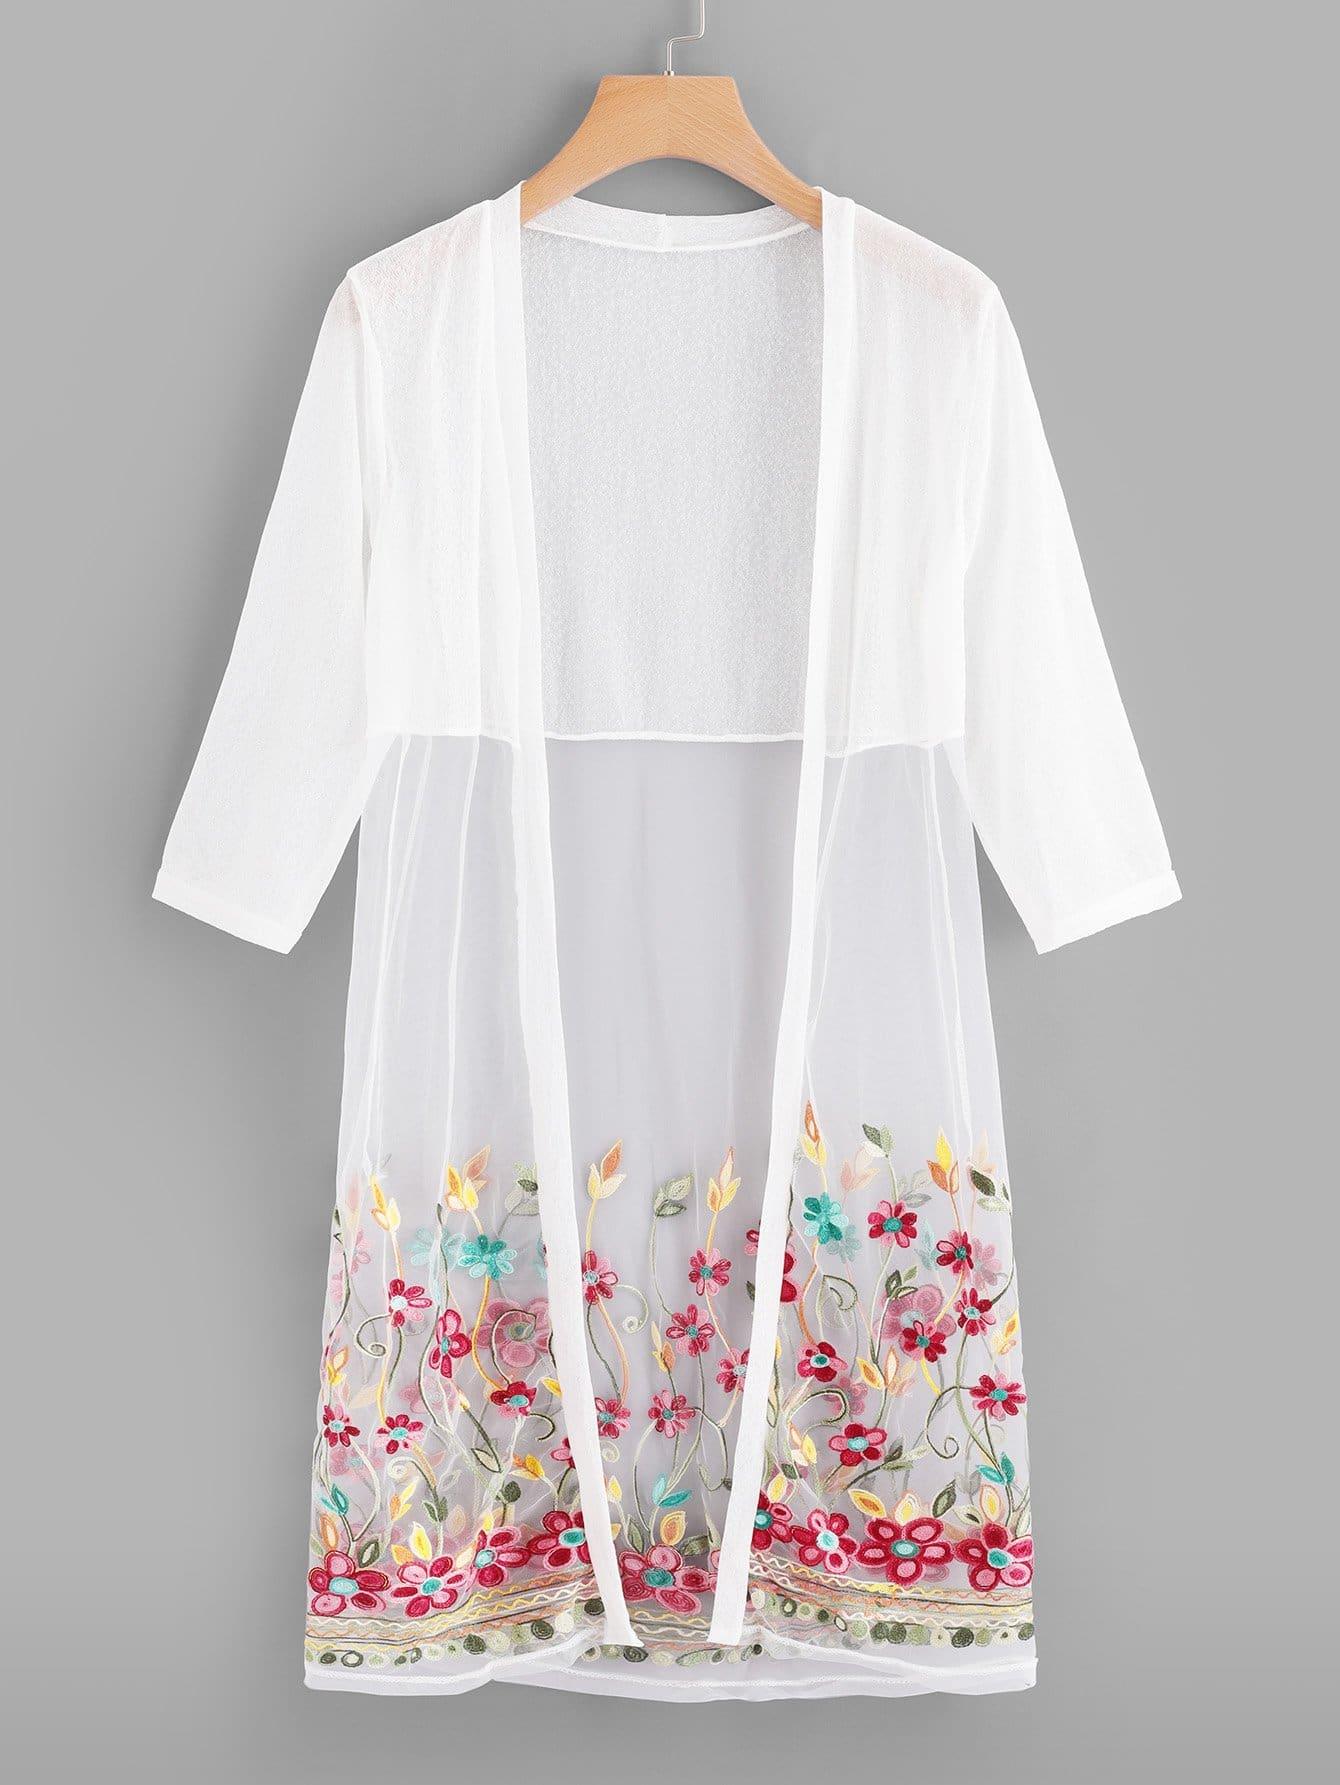 Mesh Panel Embroidery Kimono